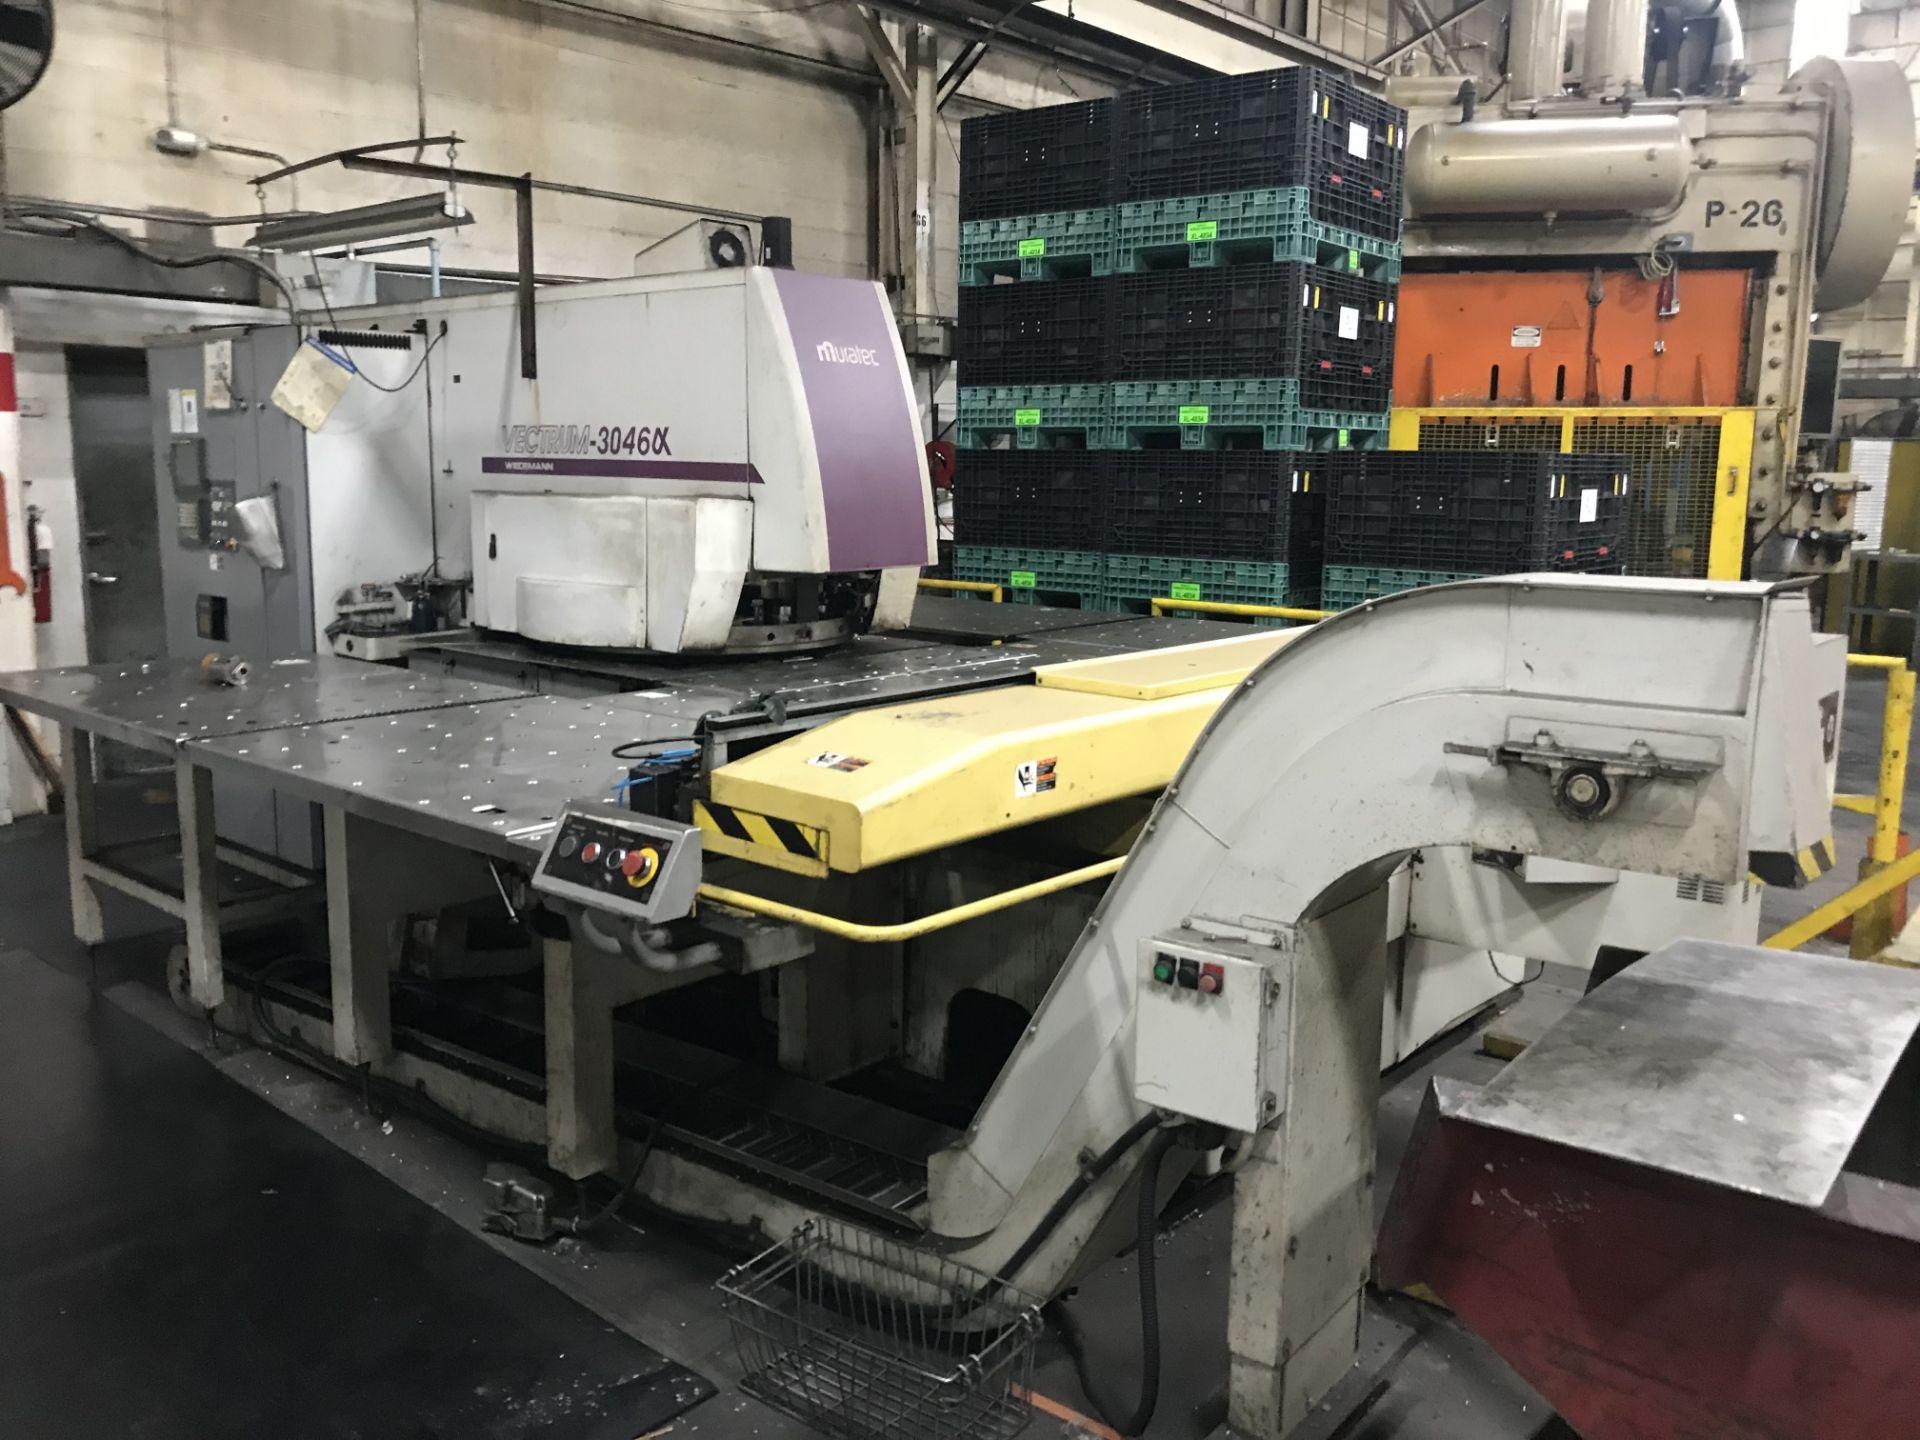 "Lot 1 - Wiedemann Model 3046 UX CNC Turret Punch, 33 Ton, 49"" x 78.7"" Sheet Size, 53"" Throat, (4) Auto-Index"